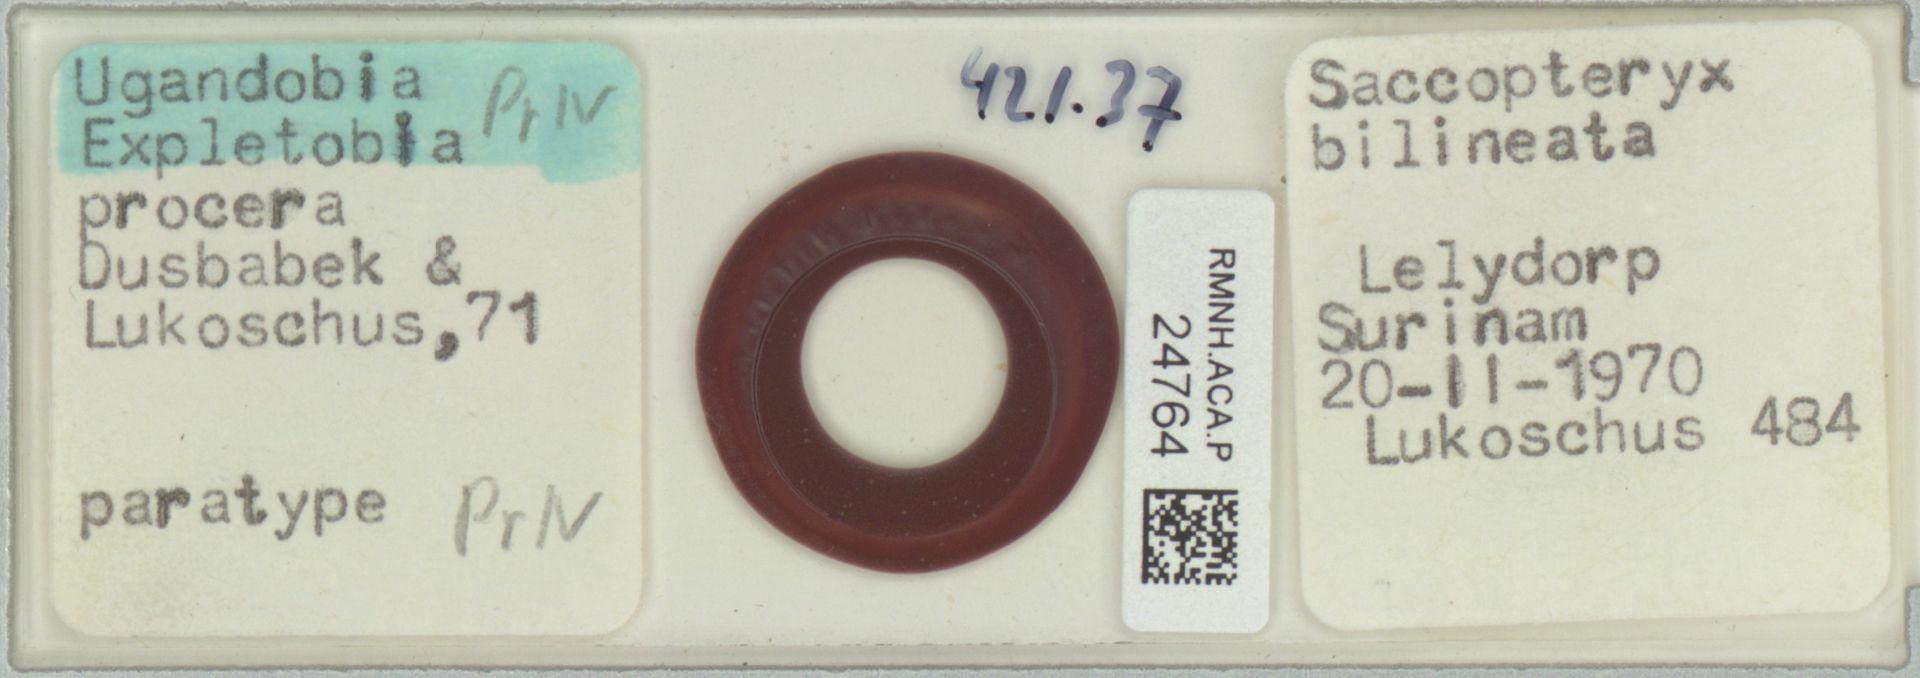 RMNH.ACA.P.24764 | Ugandobia (Expletobia) procera Dusbabek & Lukoschus, 71